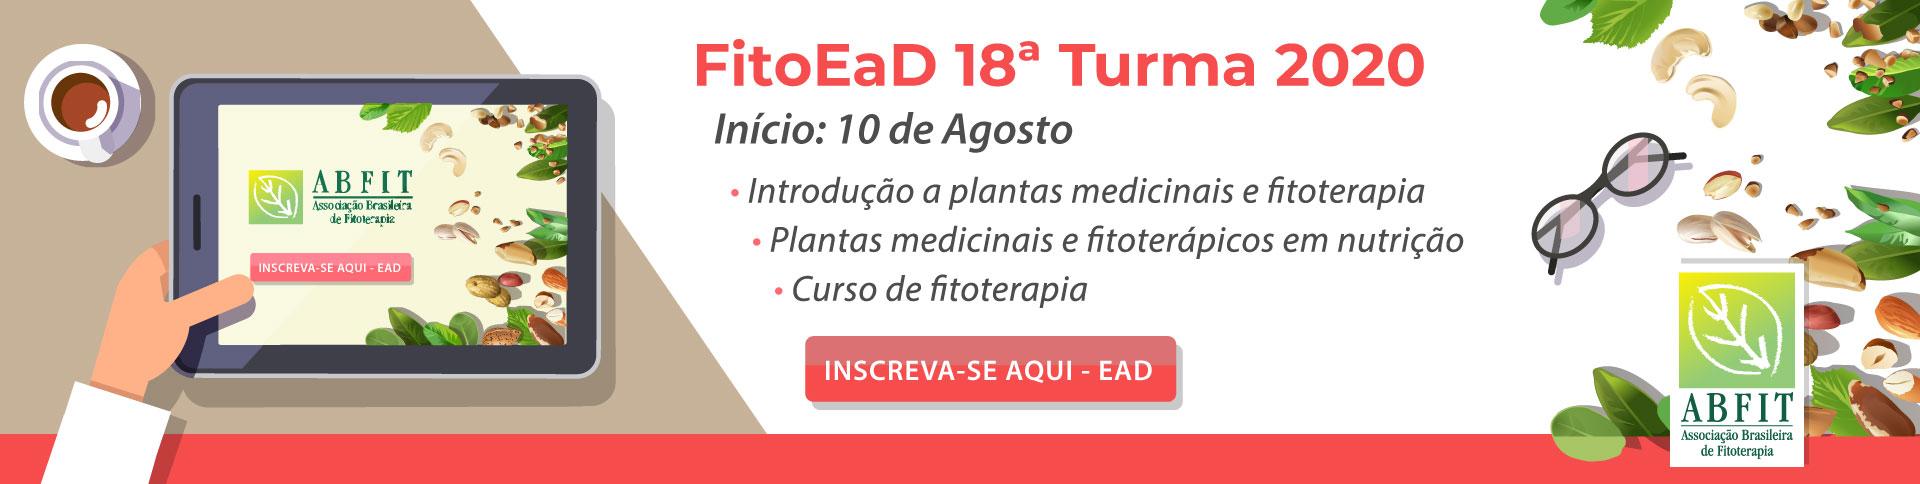 banner-post-fitoead-18a-turma-e-extensao-2020-08-200420.jpg